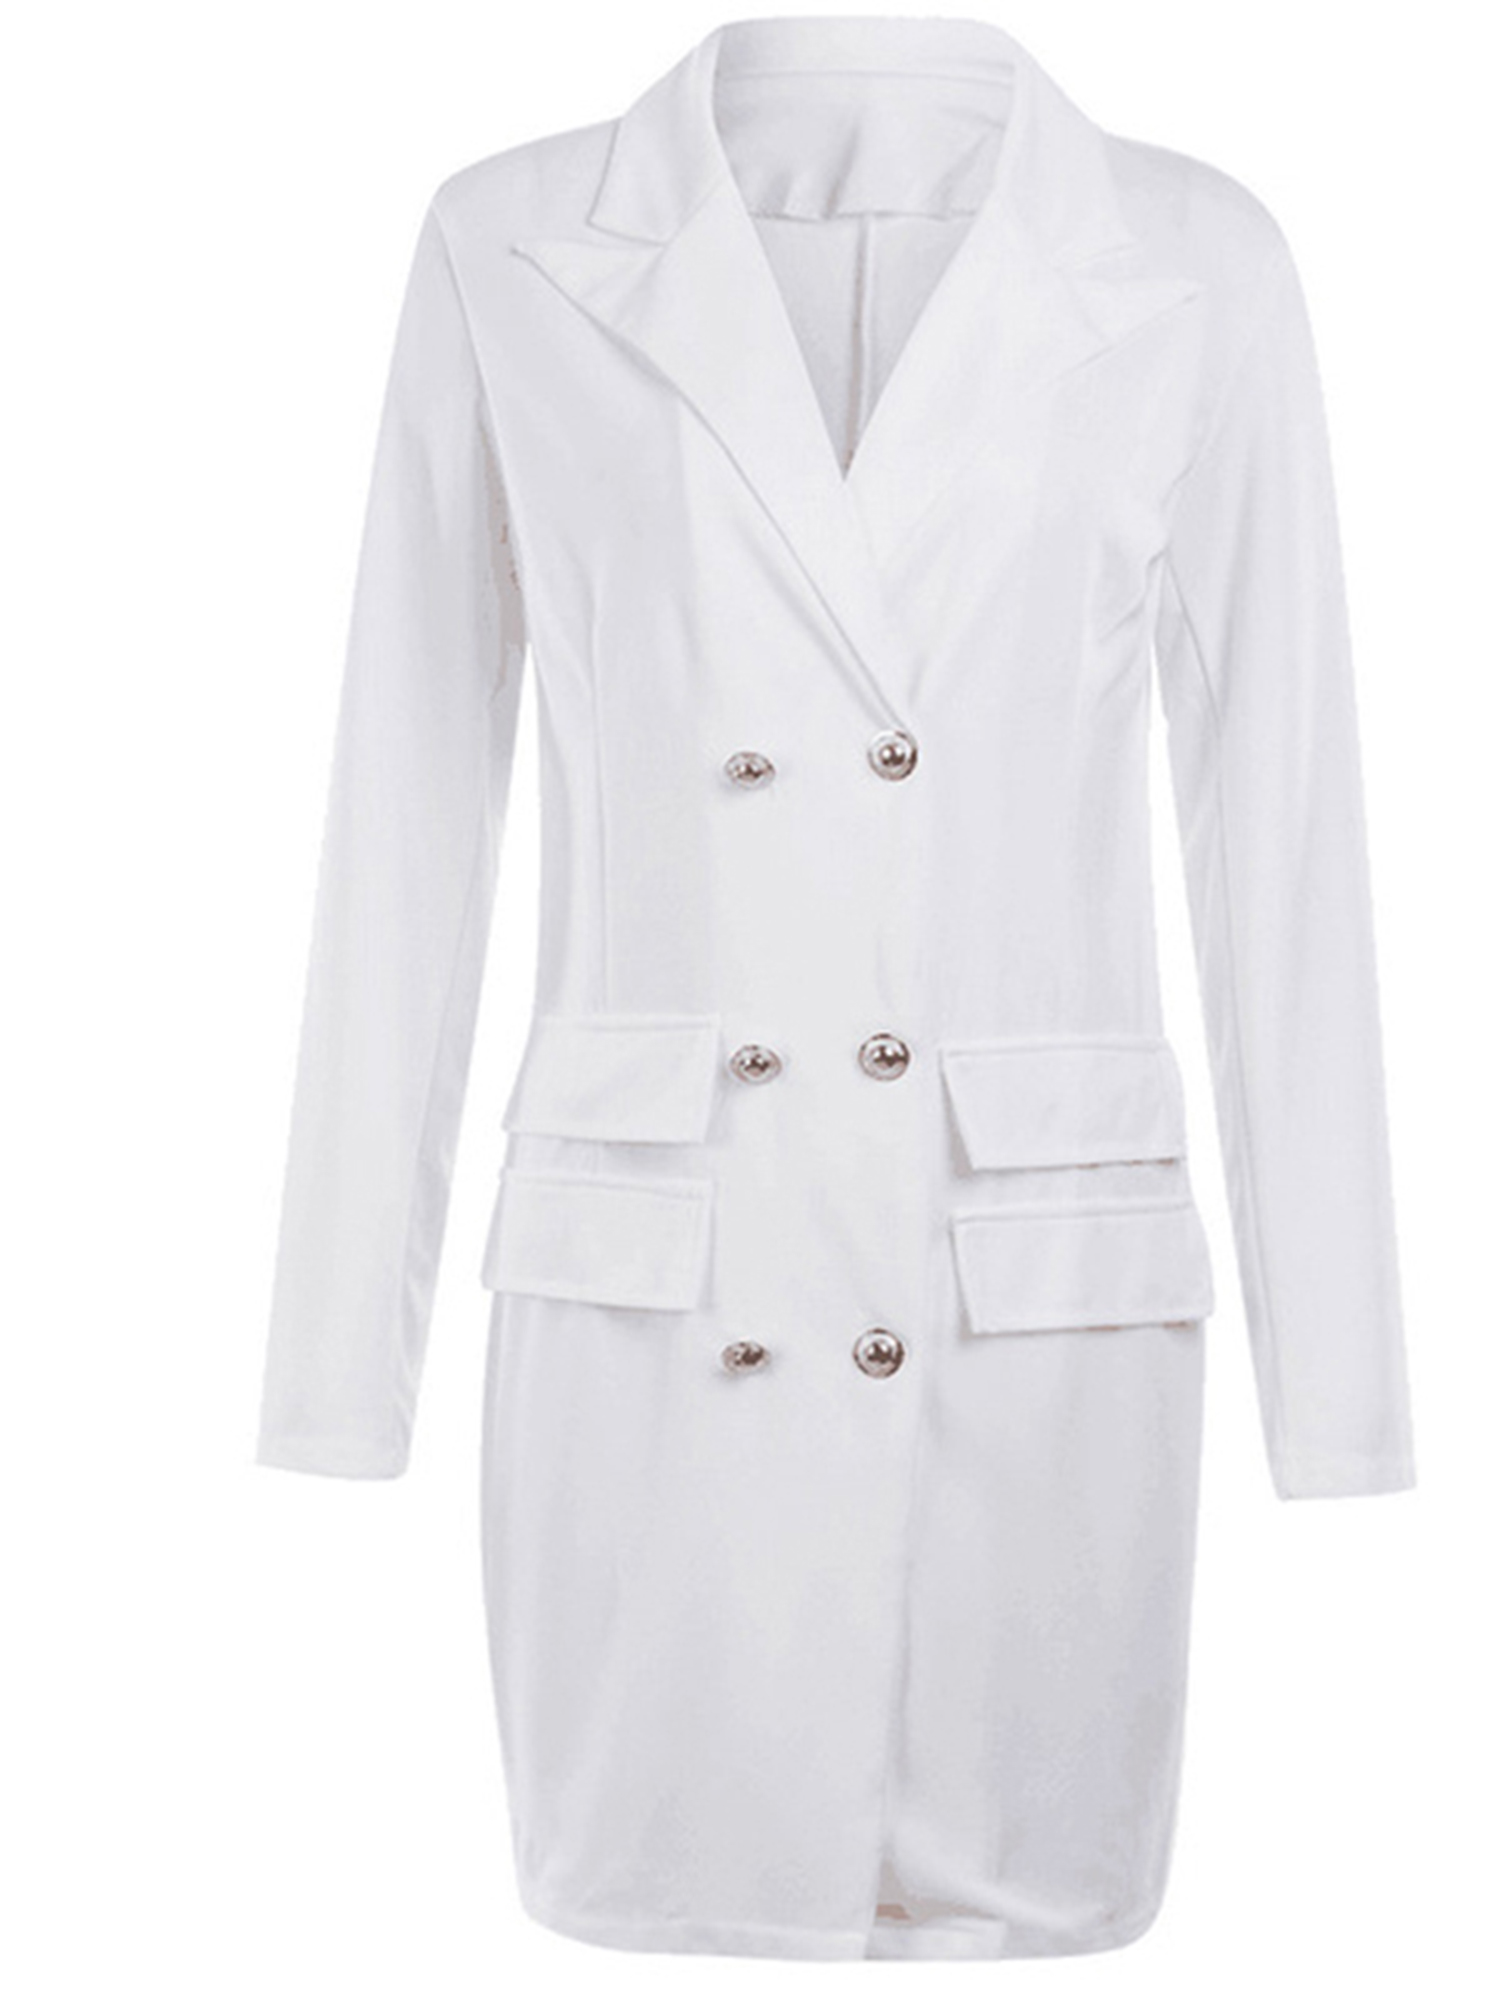 Vintage-Women-Double-Breasted-Plaid-Long-Blazer-Ladies-Jackets-Suits-Coat-Pocket miniatura 20